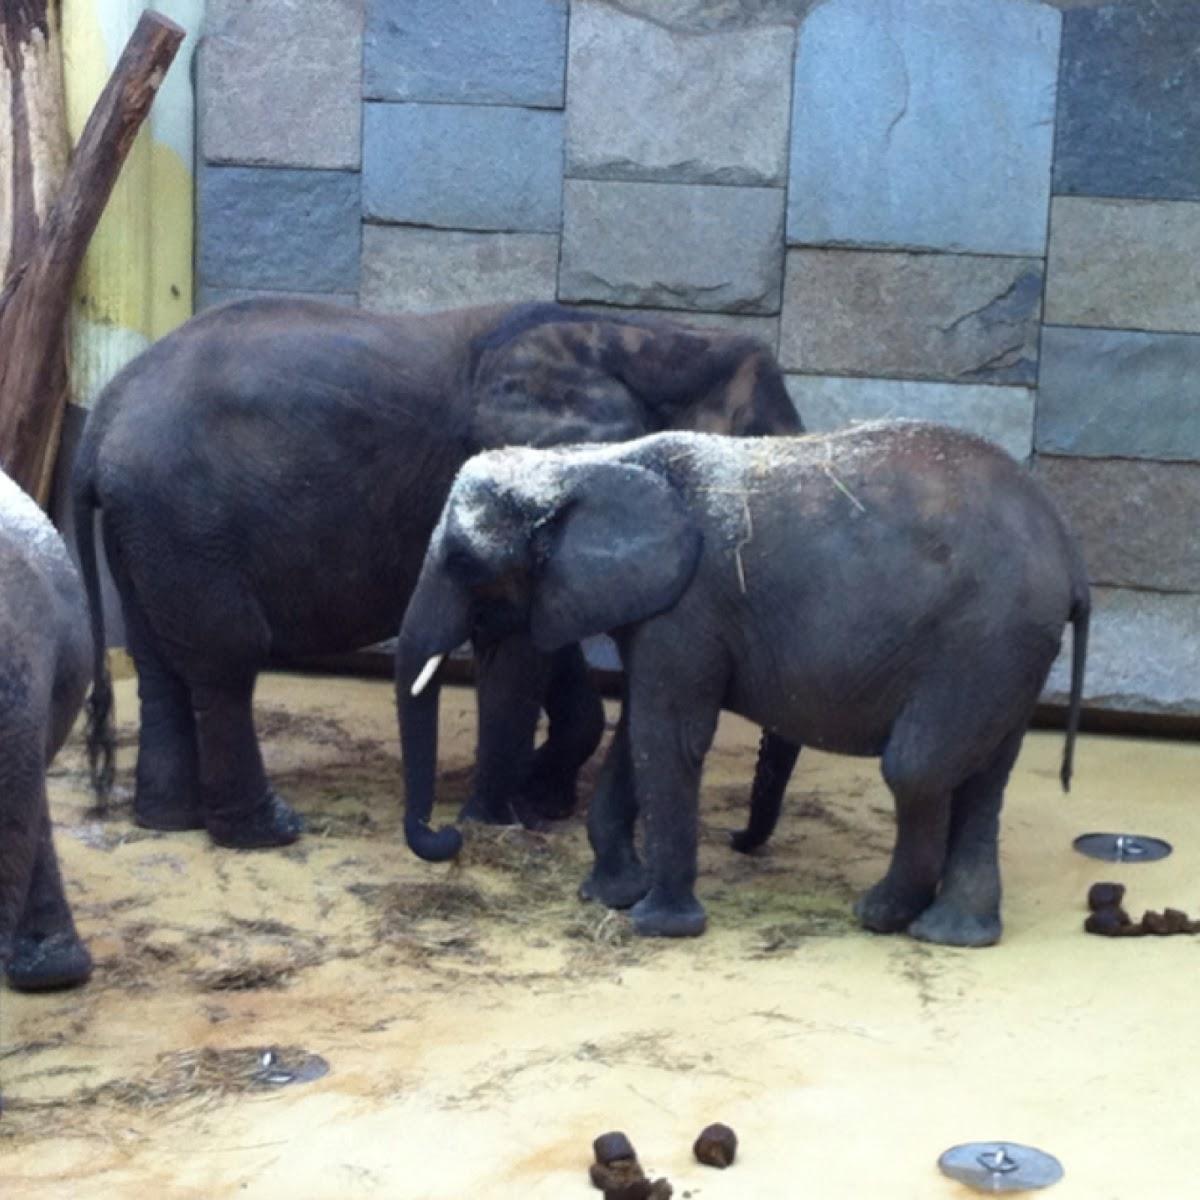 Afrikanischer Elefant, Steppenelefant / African Bush Elefant